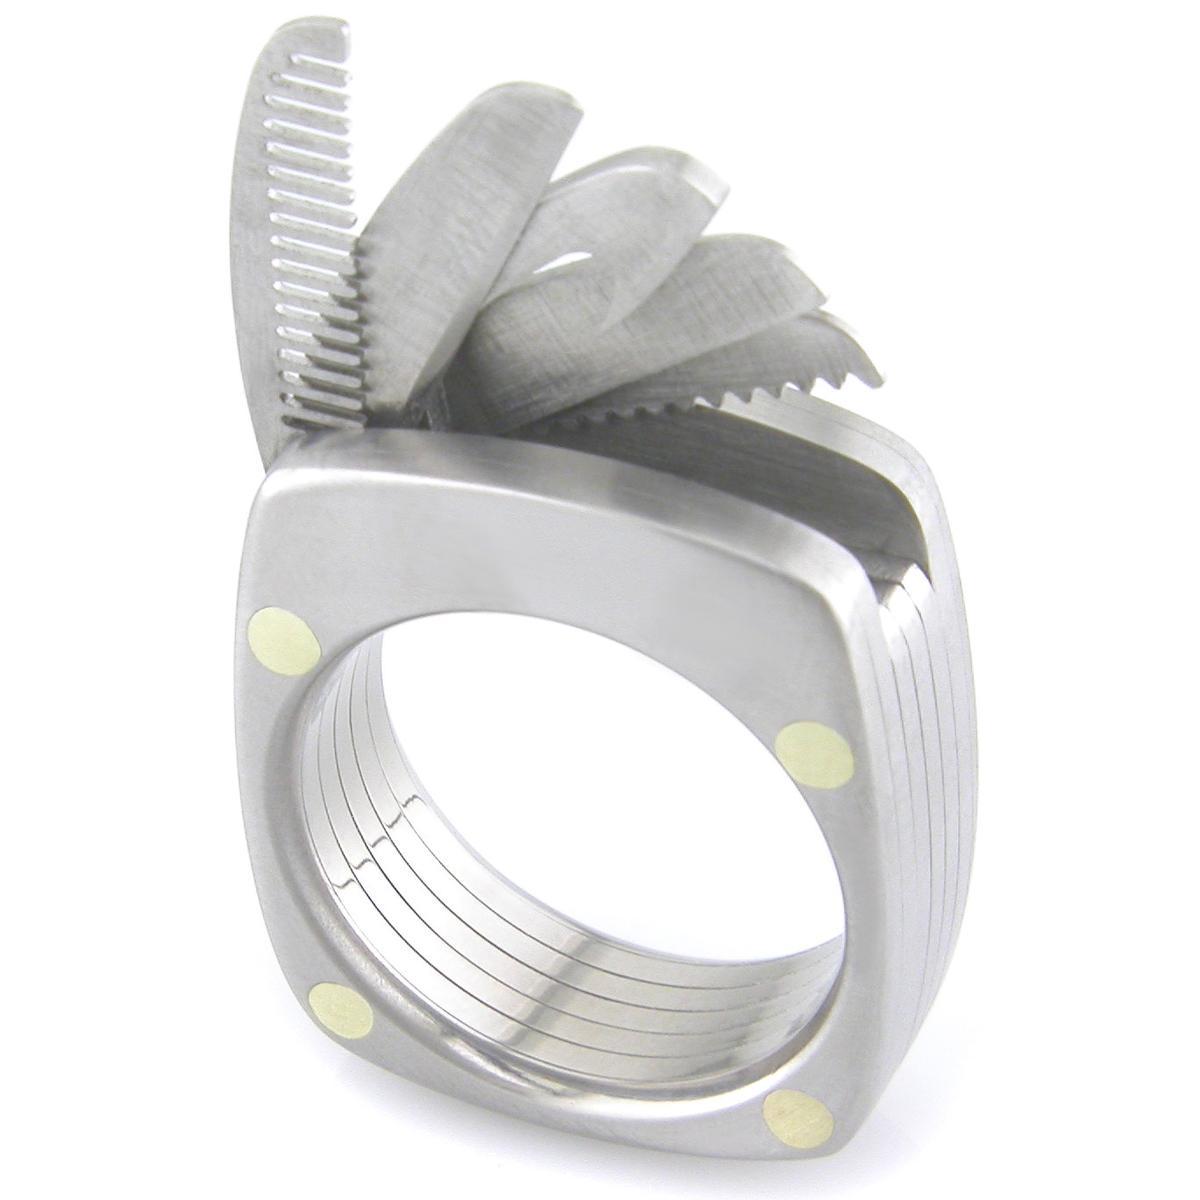 The Titanium Utility Ring incorporates five tiny folding tools